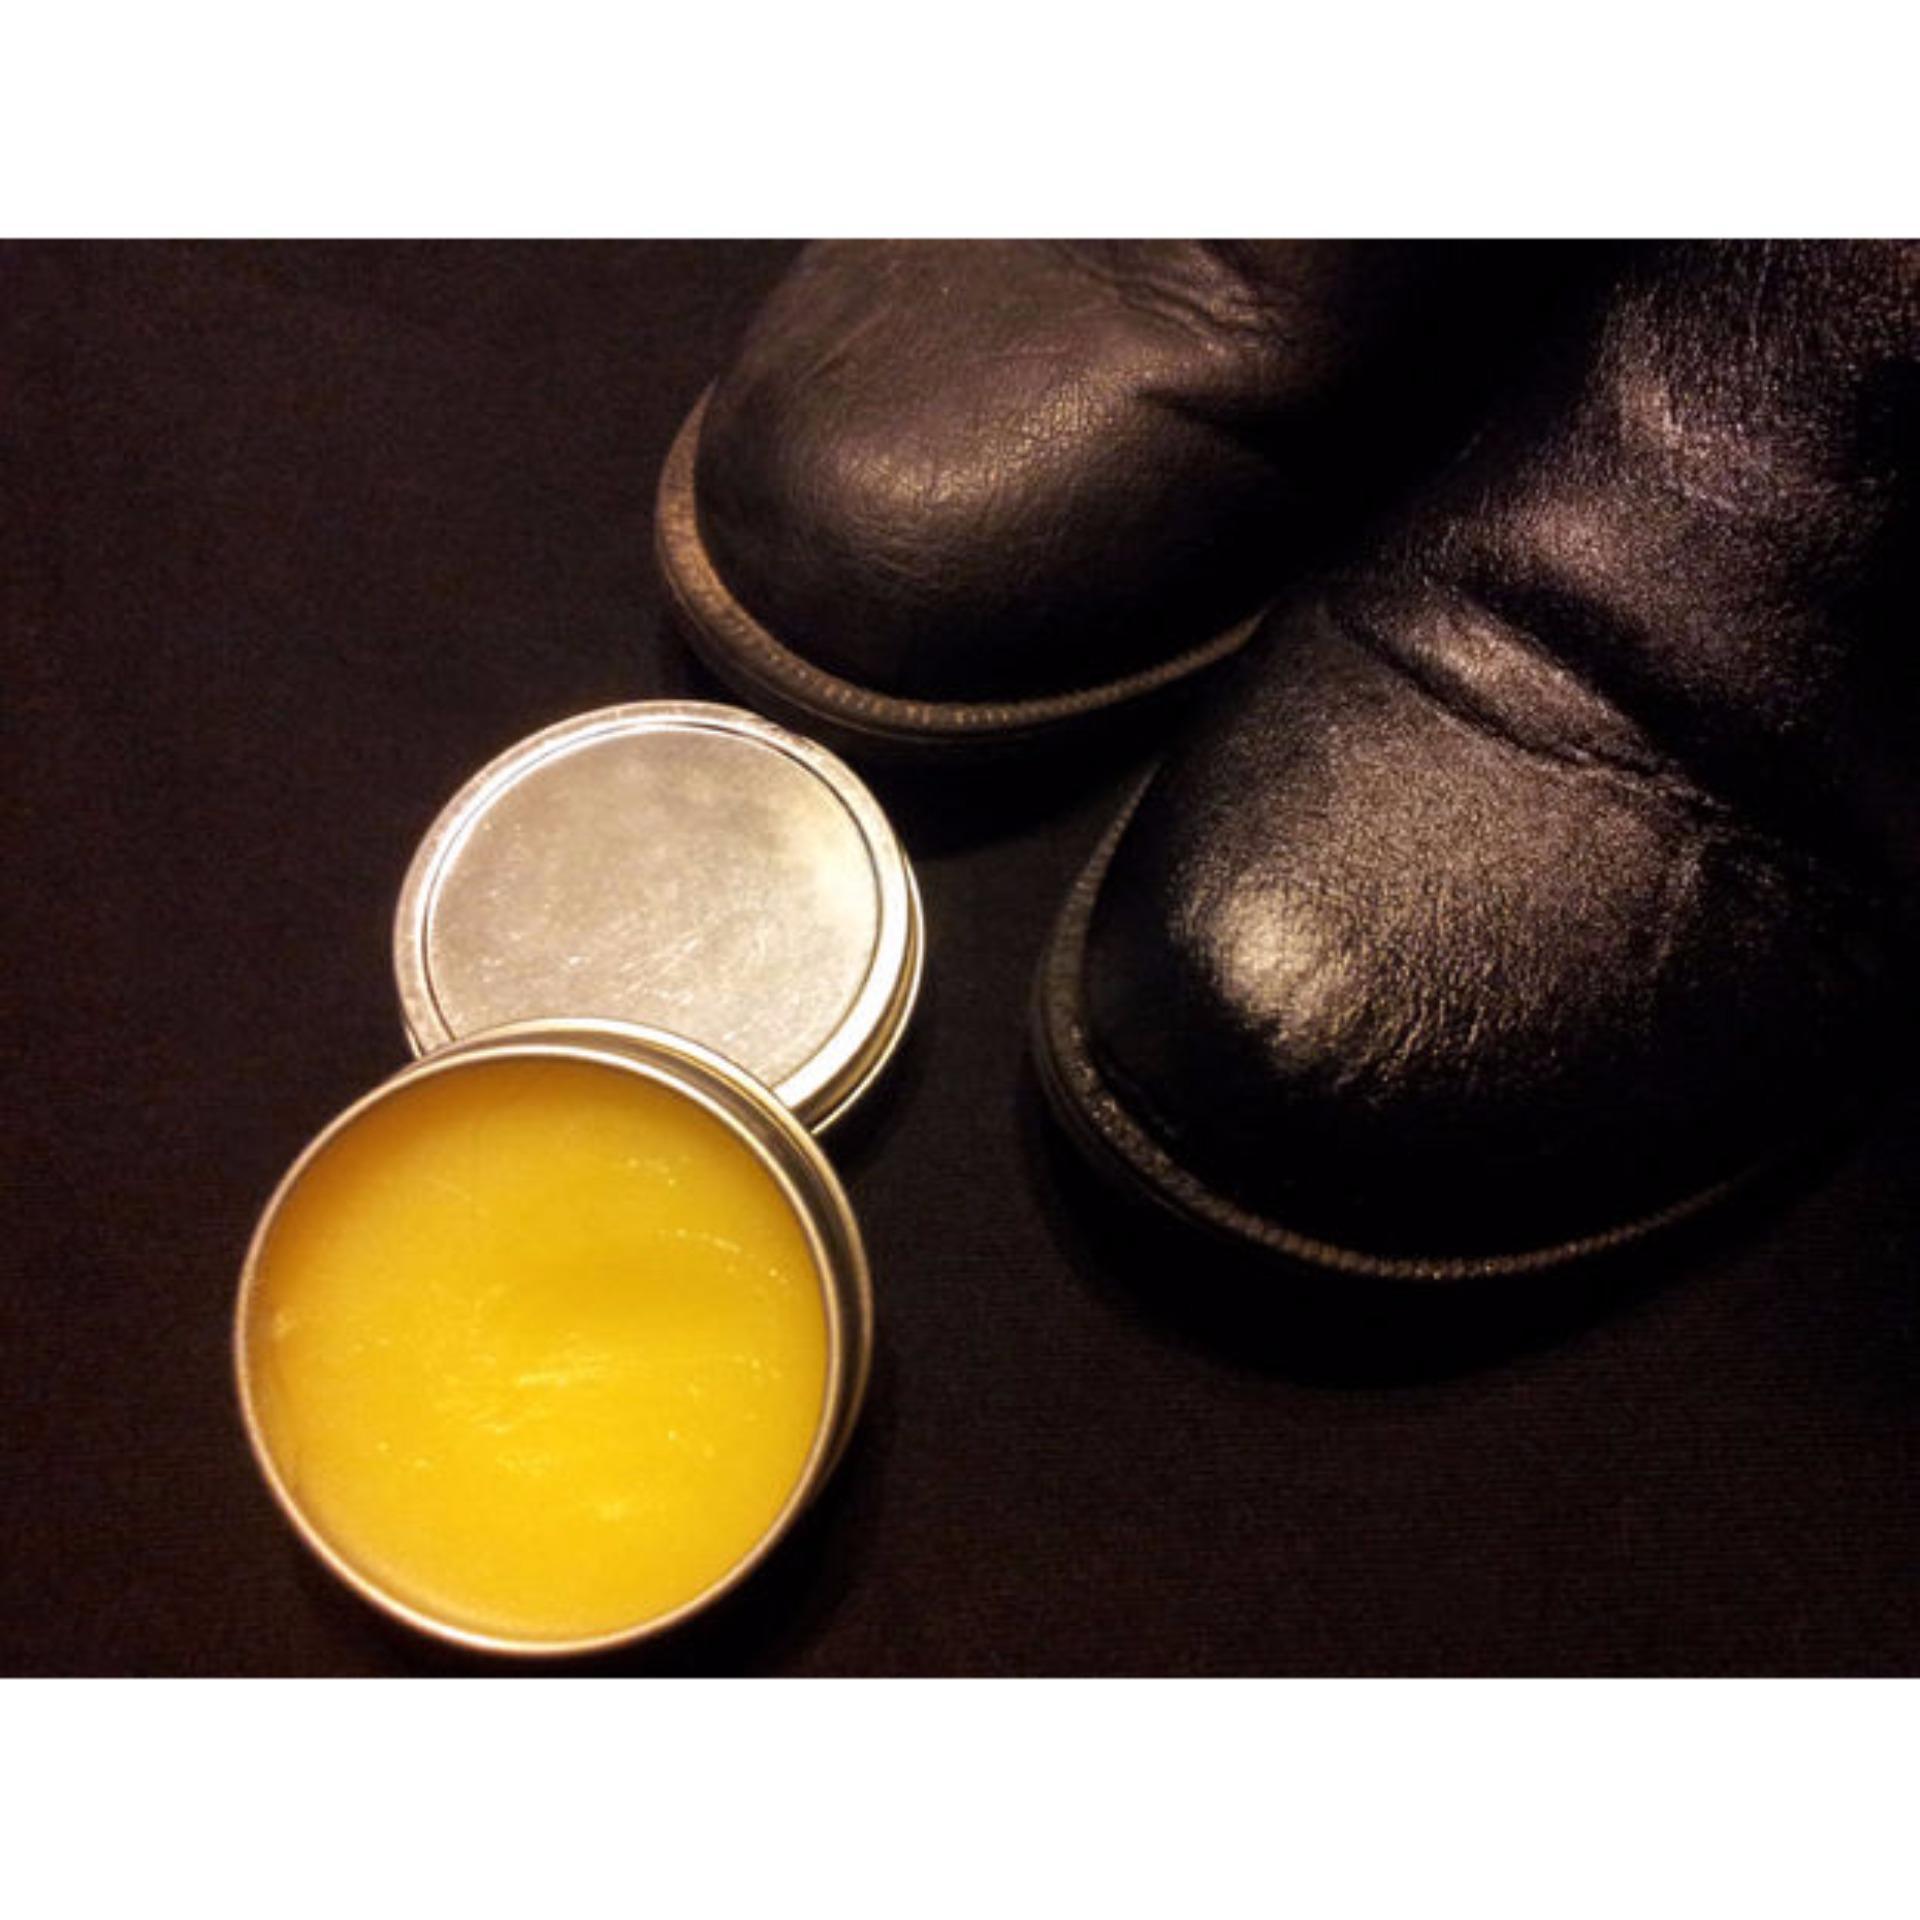 Terang Tidak Berwarna Semir Sepatu Kulit Kuas Daftar Harga Shoe Polish Leather Extrawax Jaket Tas